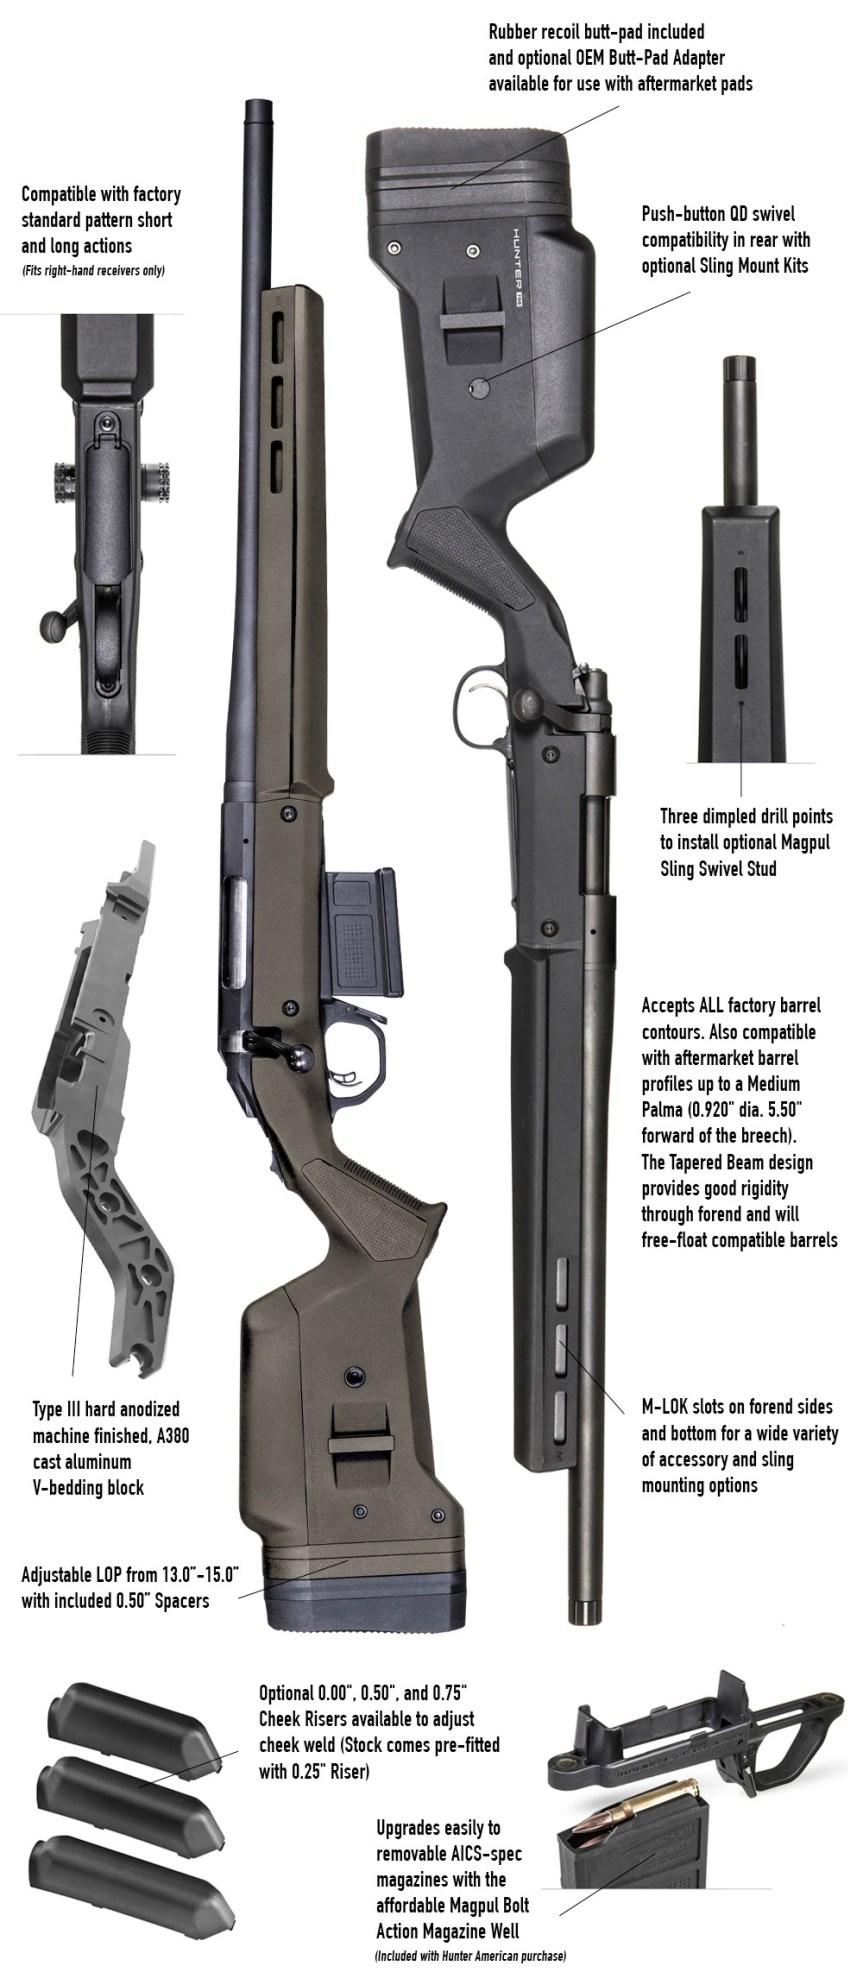 magpul hunter american stock ruger american sniper rifle magpul upgrade markesmen rifle tactical sniper 2